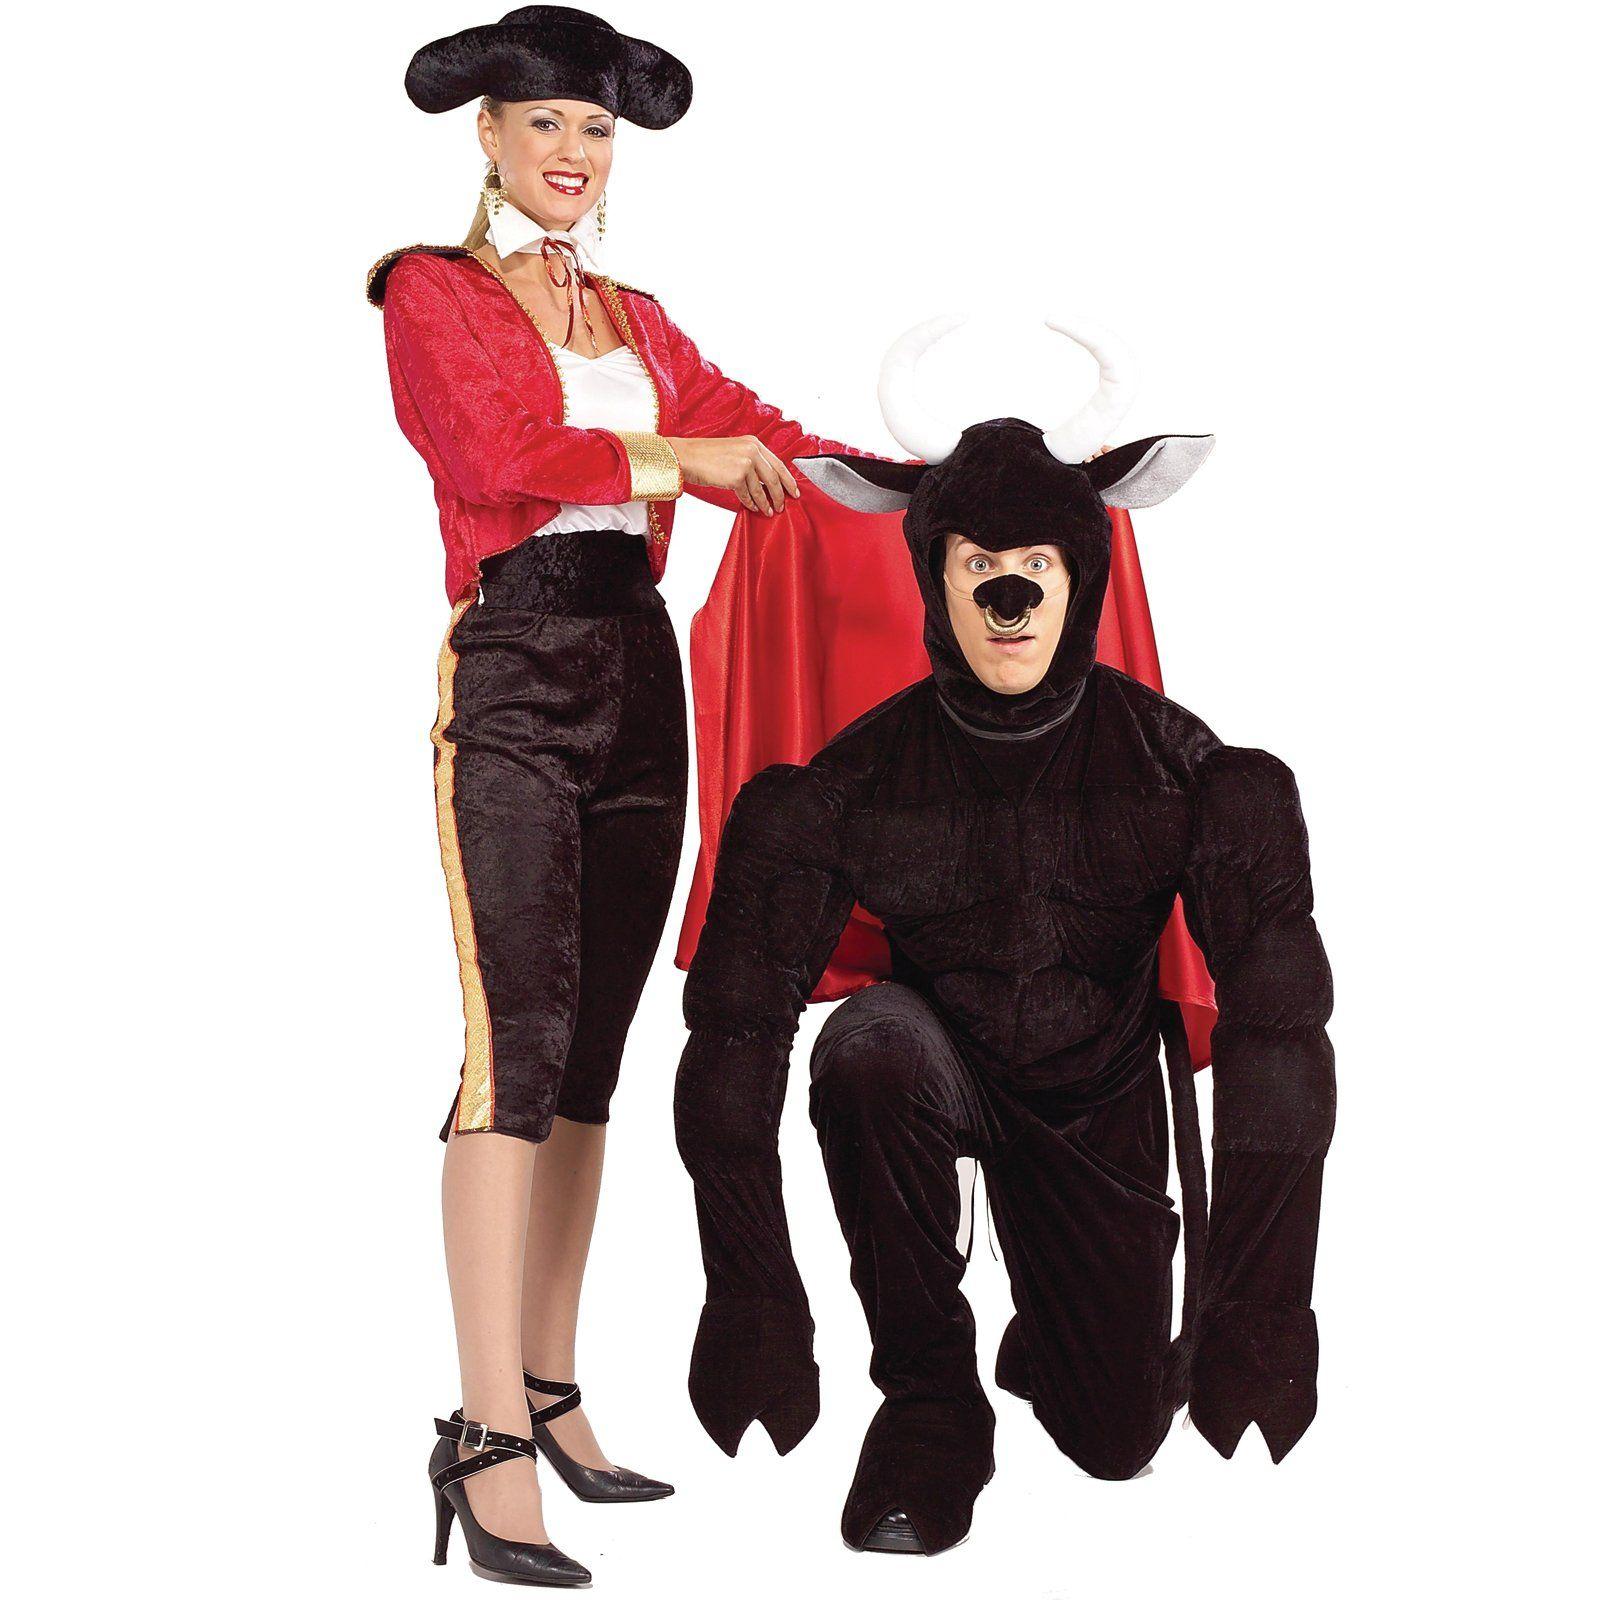 Funny Matador and Bull costumes!   Couples Halloween   Pinterest ...